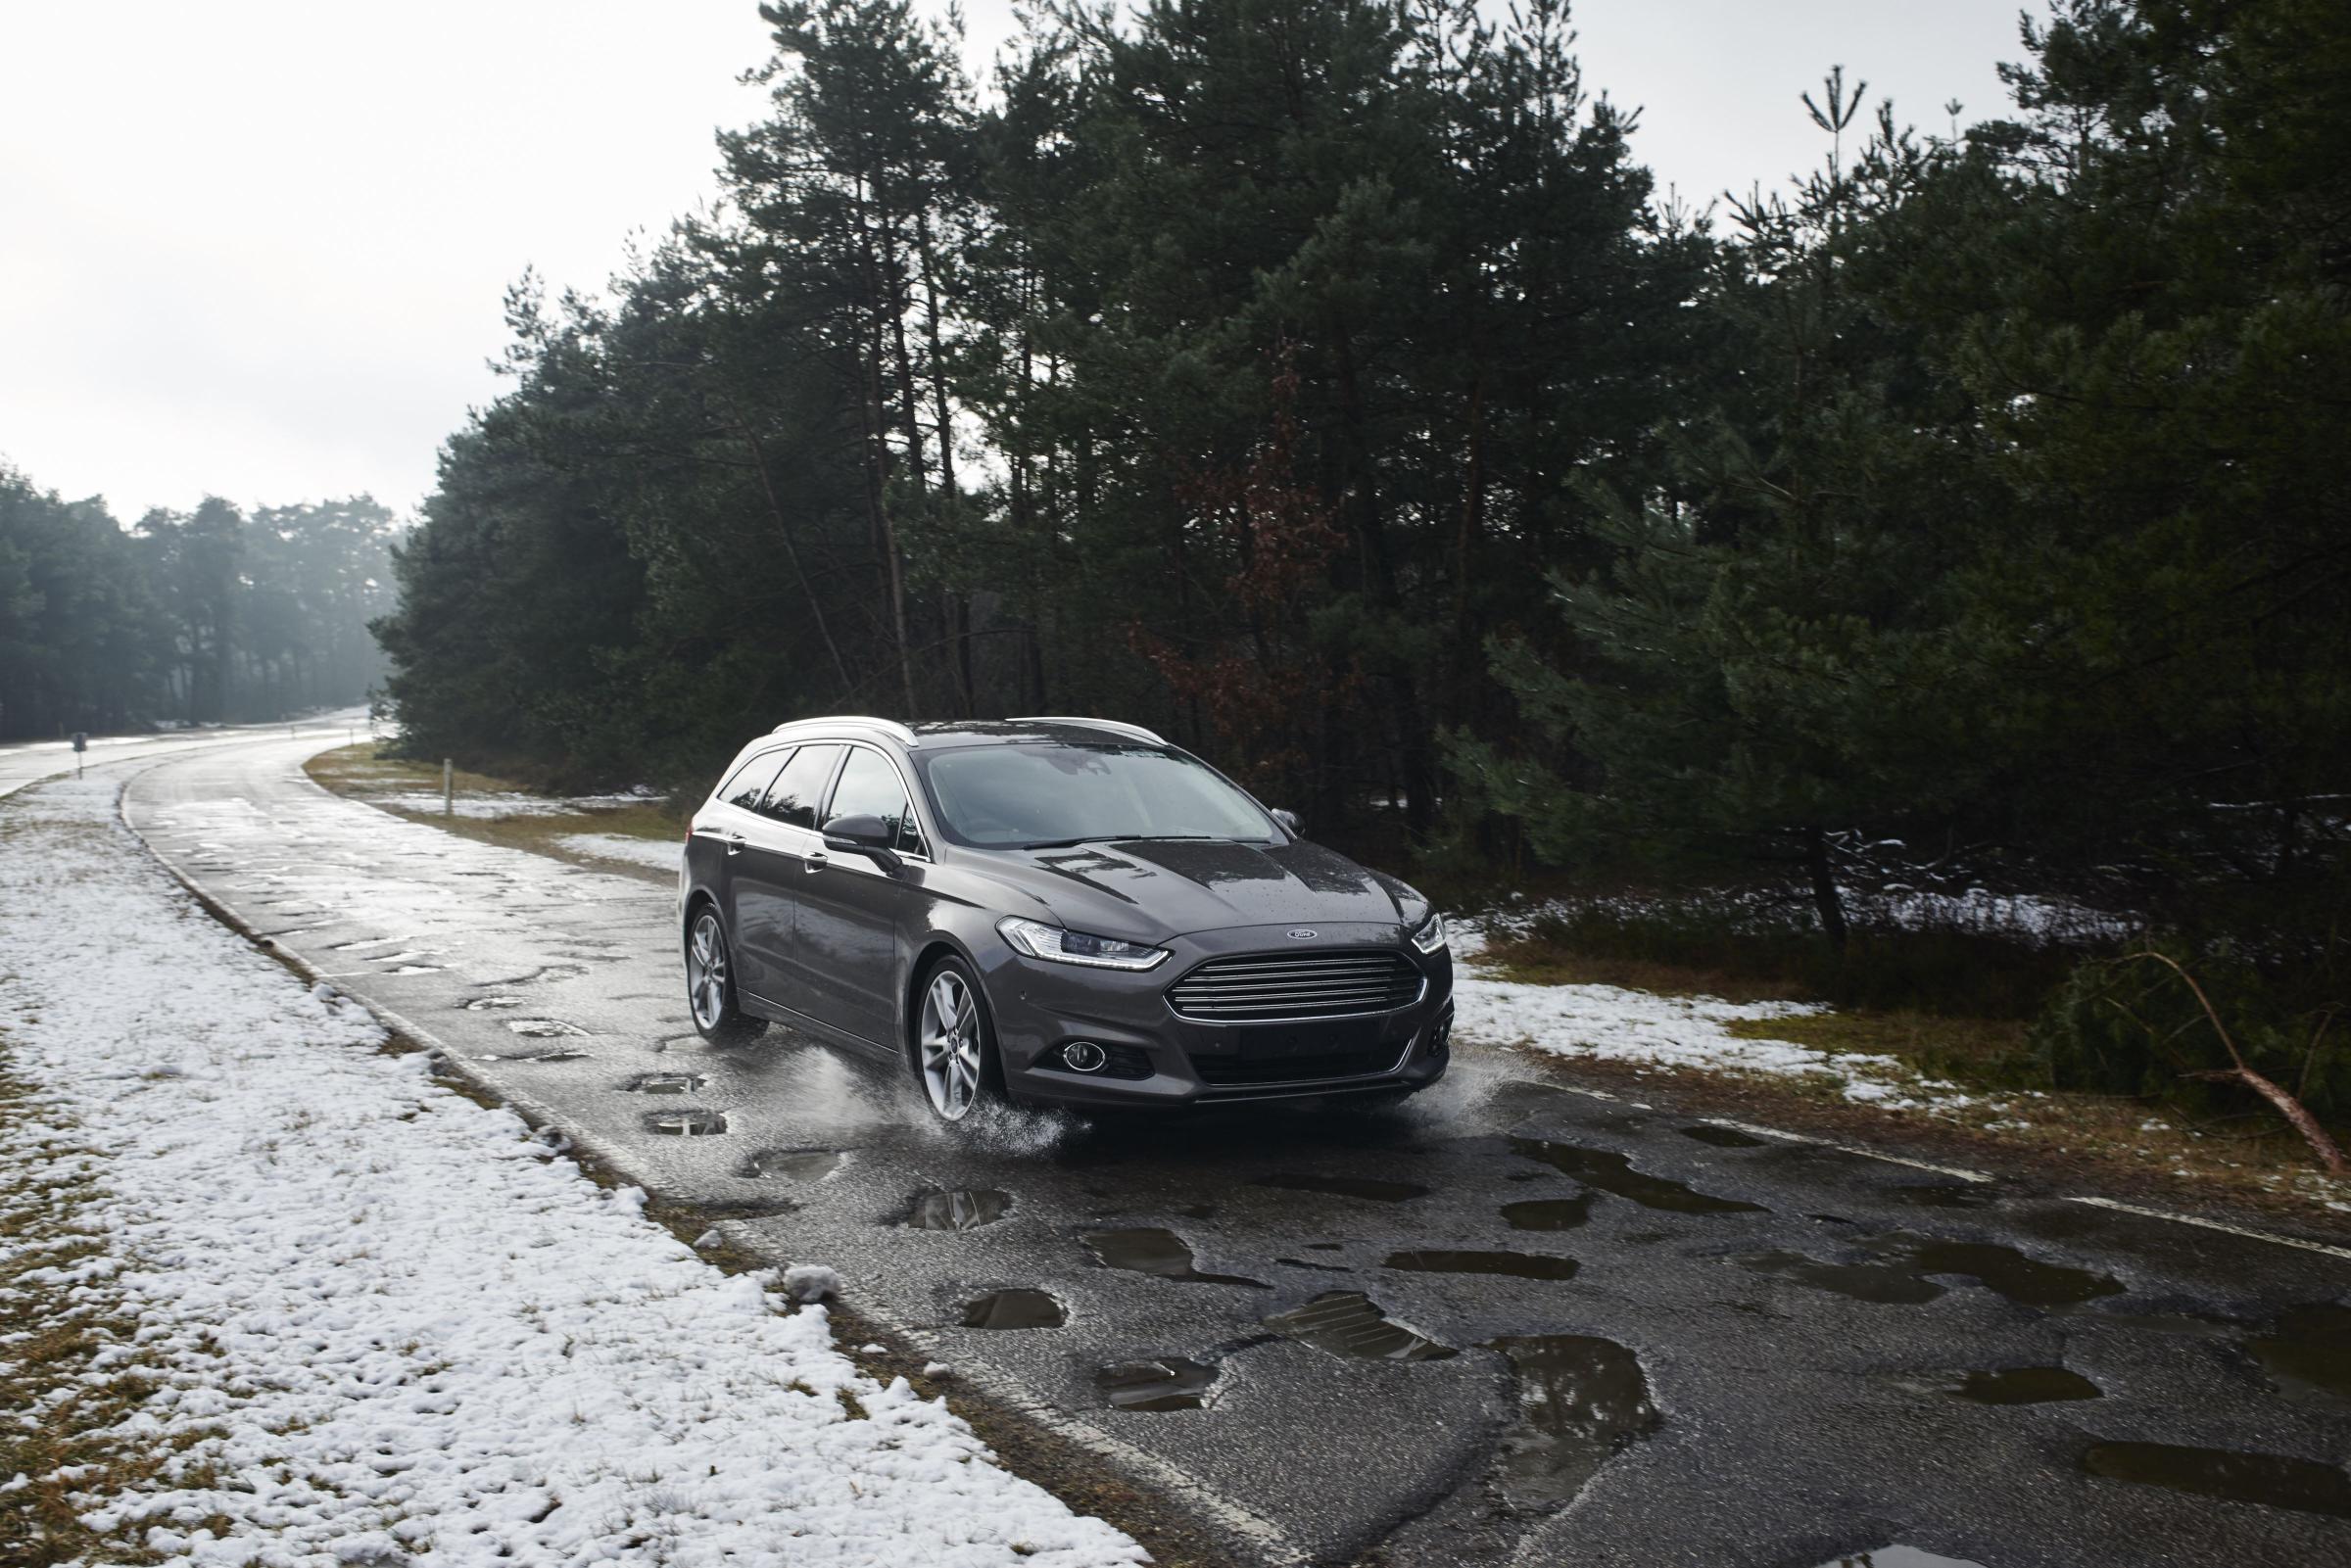 Carretera Ford 2